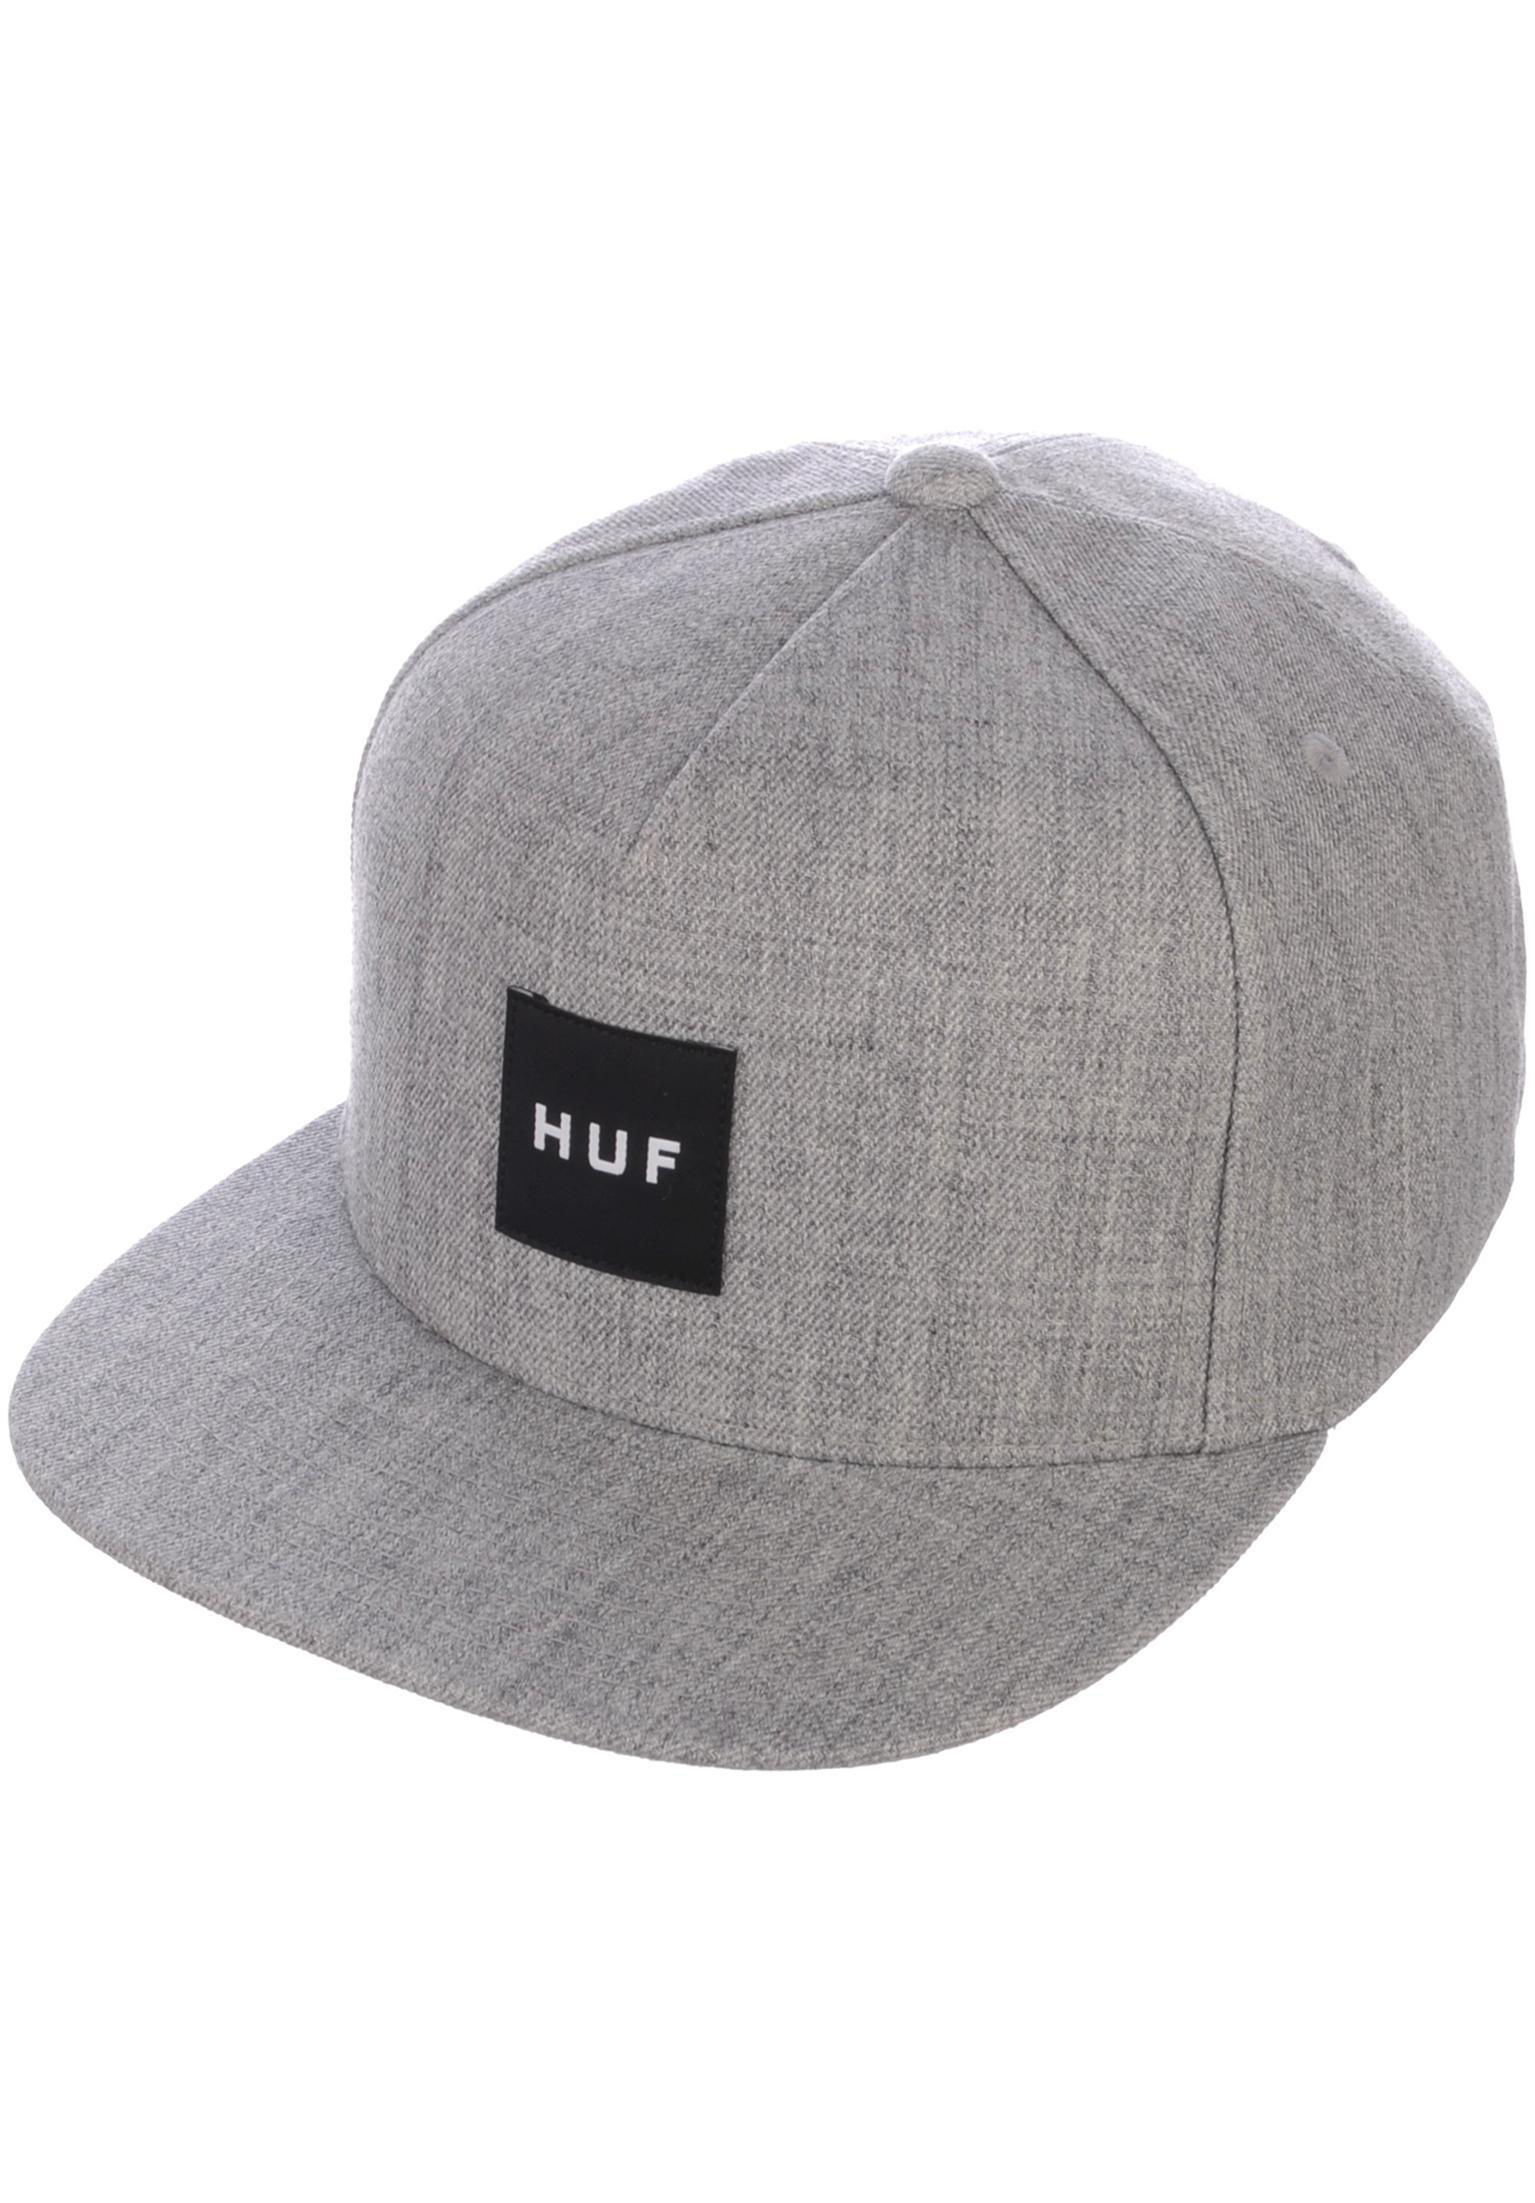 8558fcfd3ce Box Logo Snapback HUF Caps in charcoal for Men